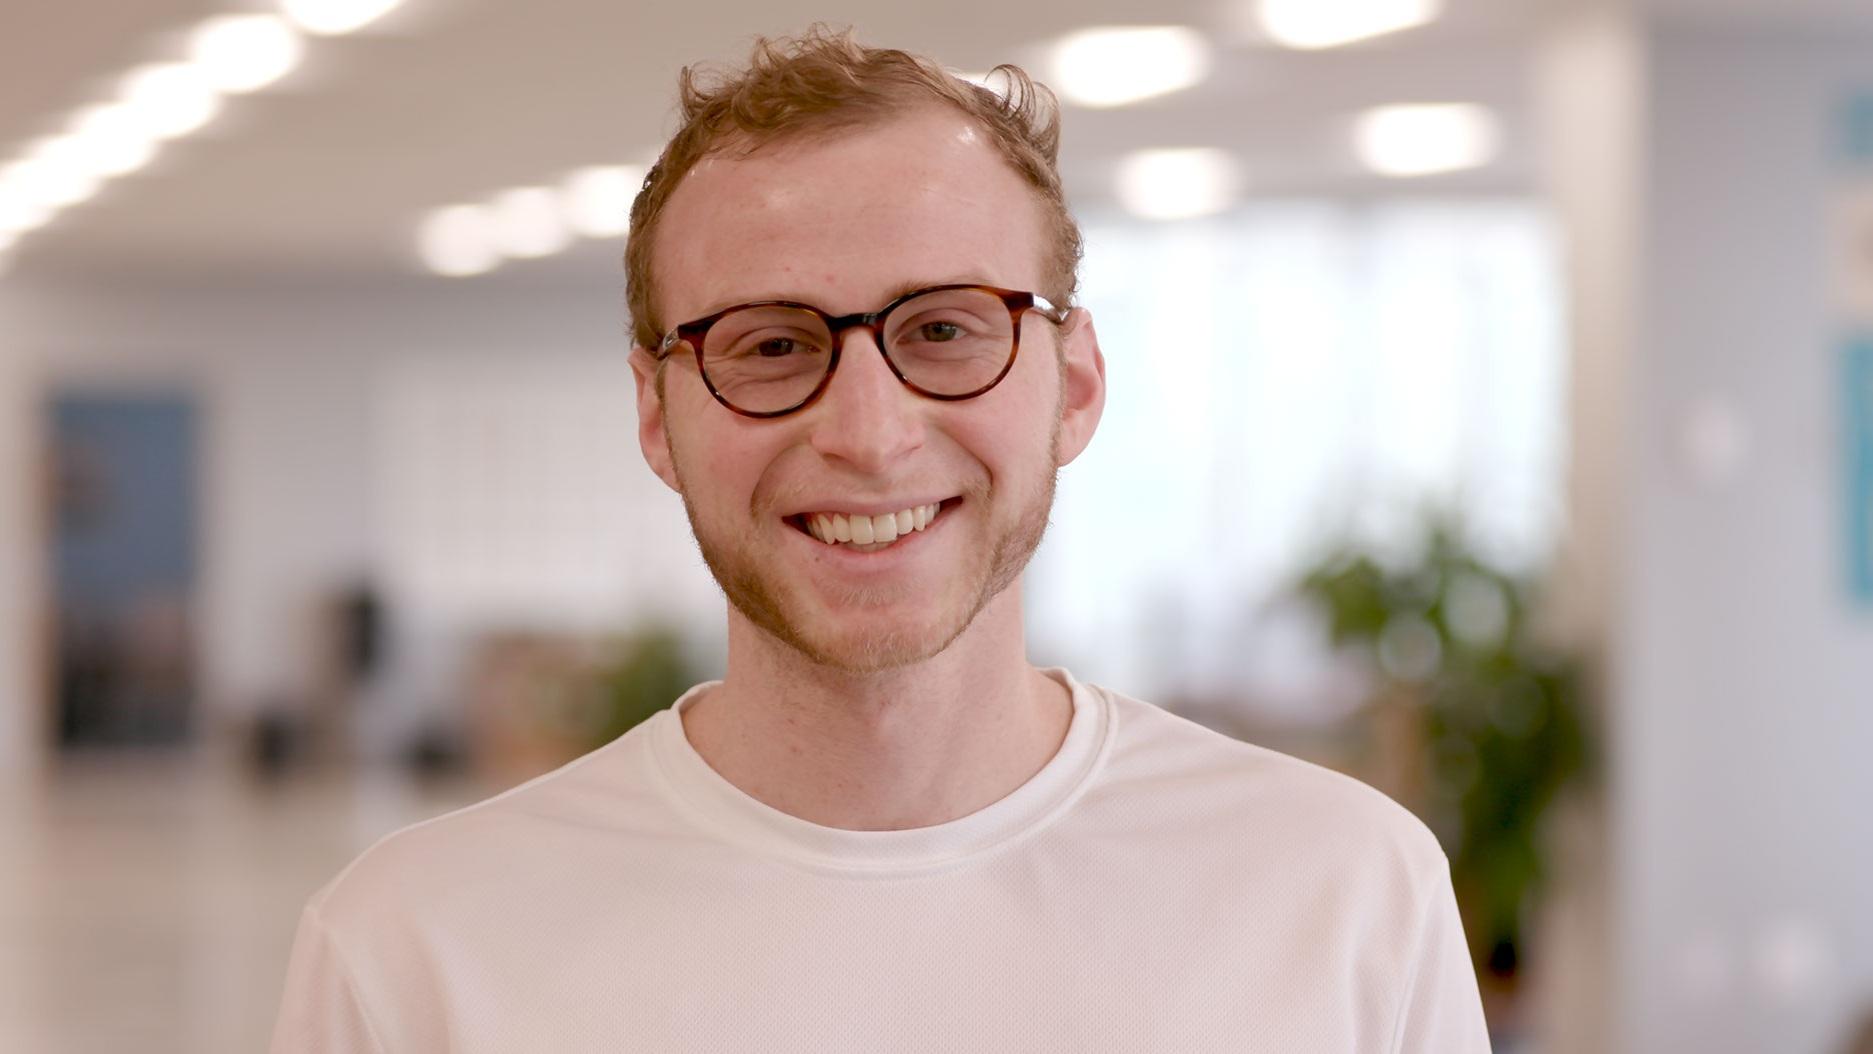 Jake Teitelbaum - Founder